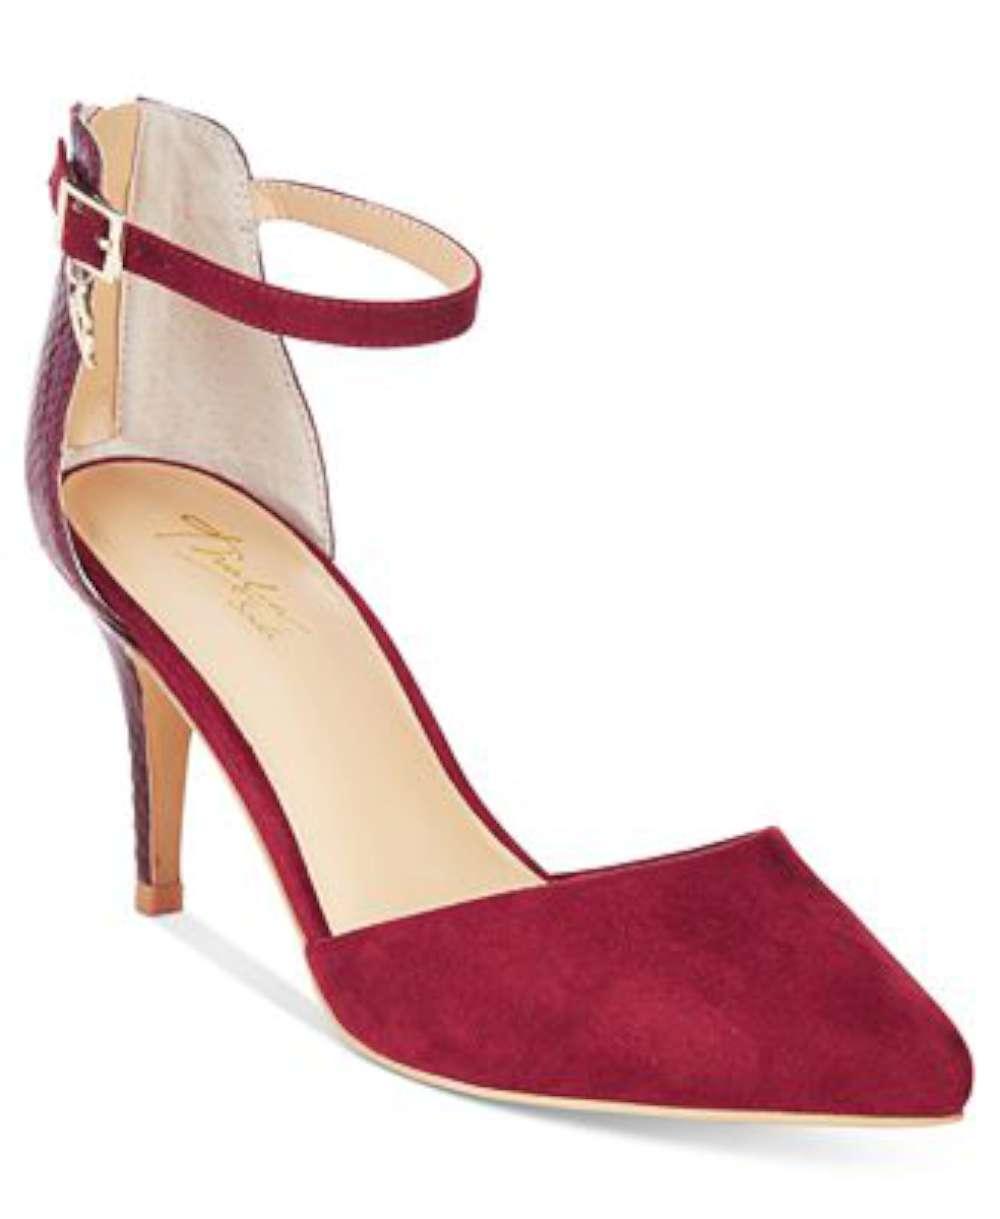 Thalia Sodi Womens Vanesssa Pointed Toe Ankle Strap Elderberry/Snake Size 9.5